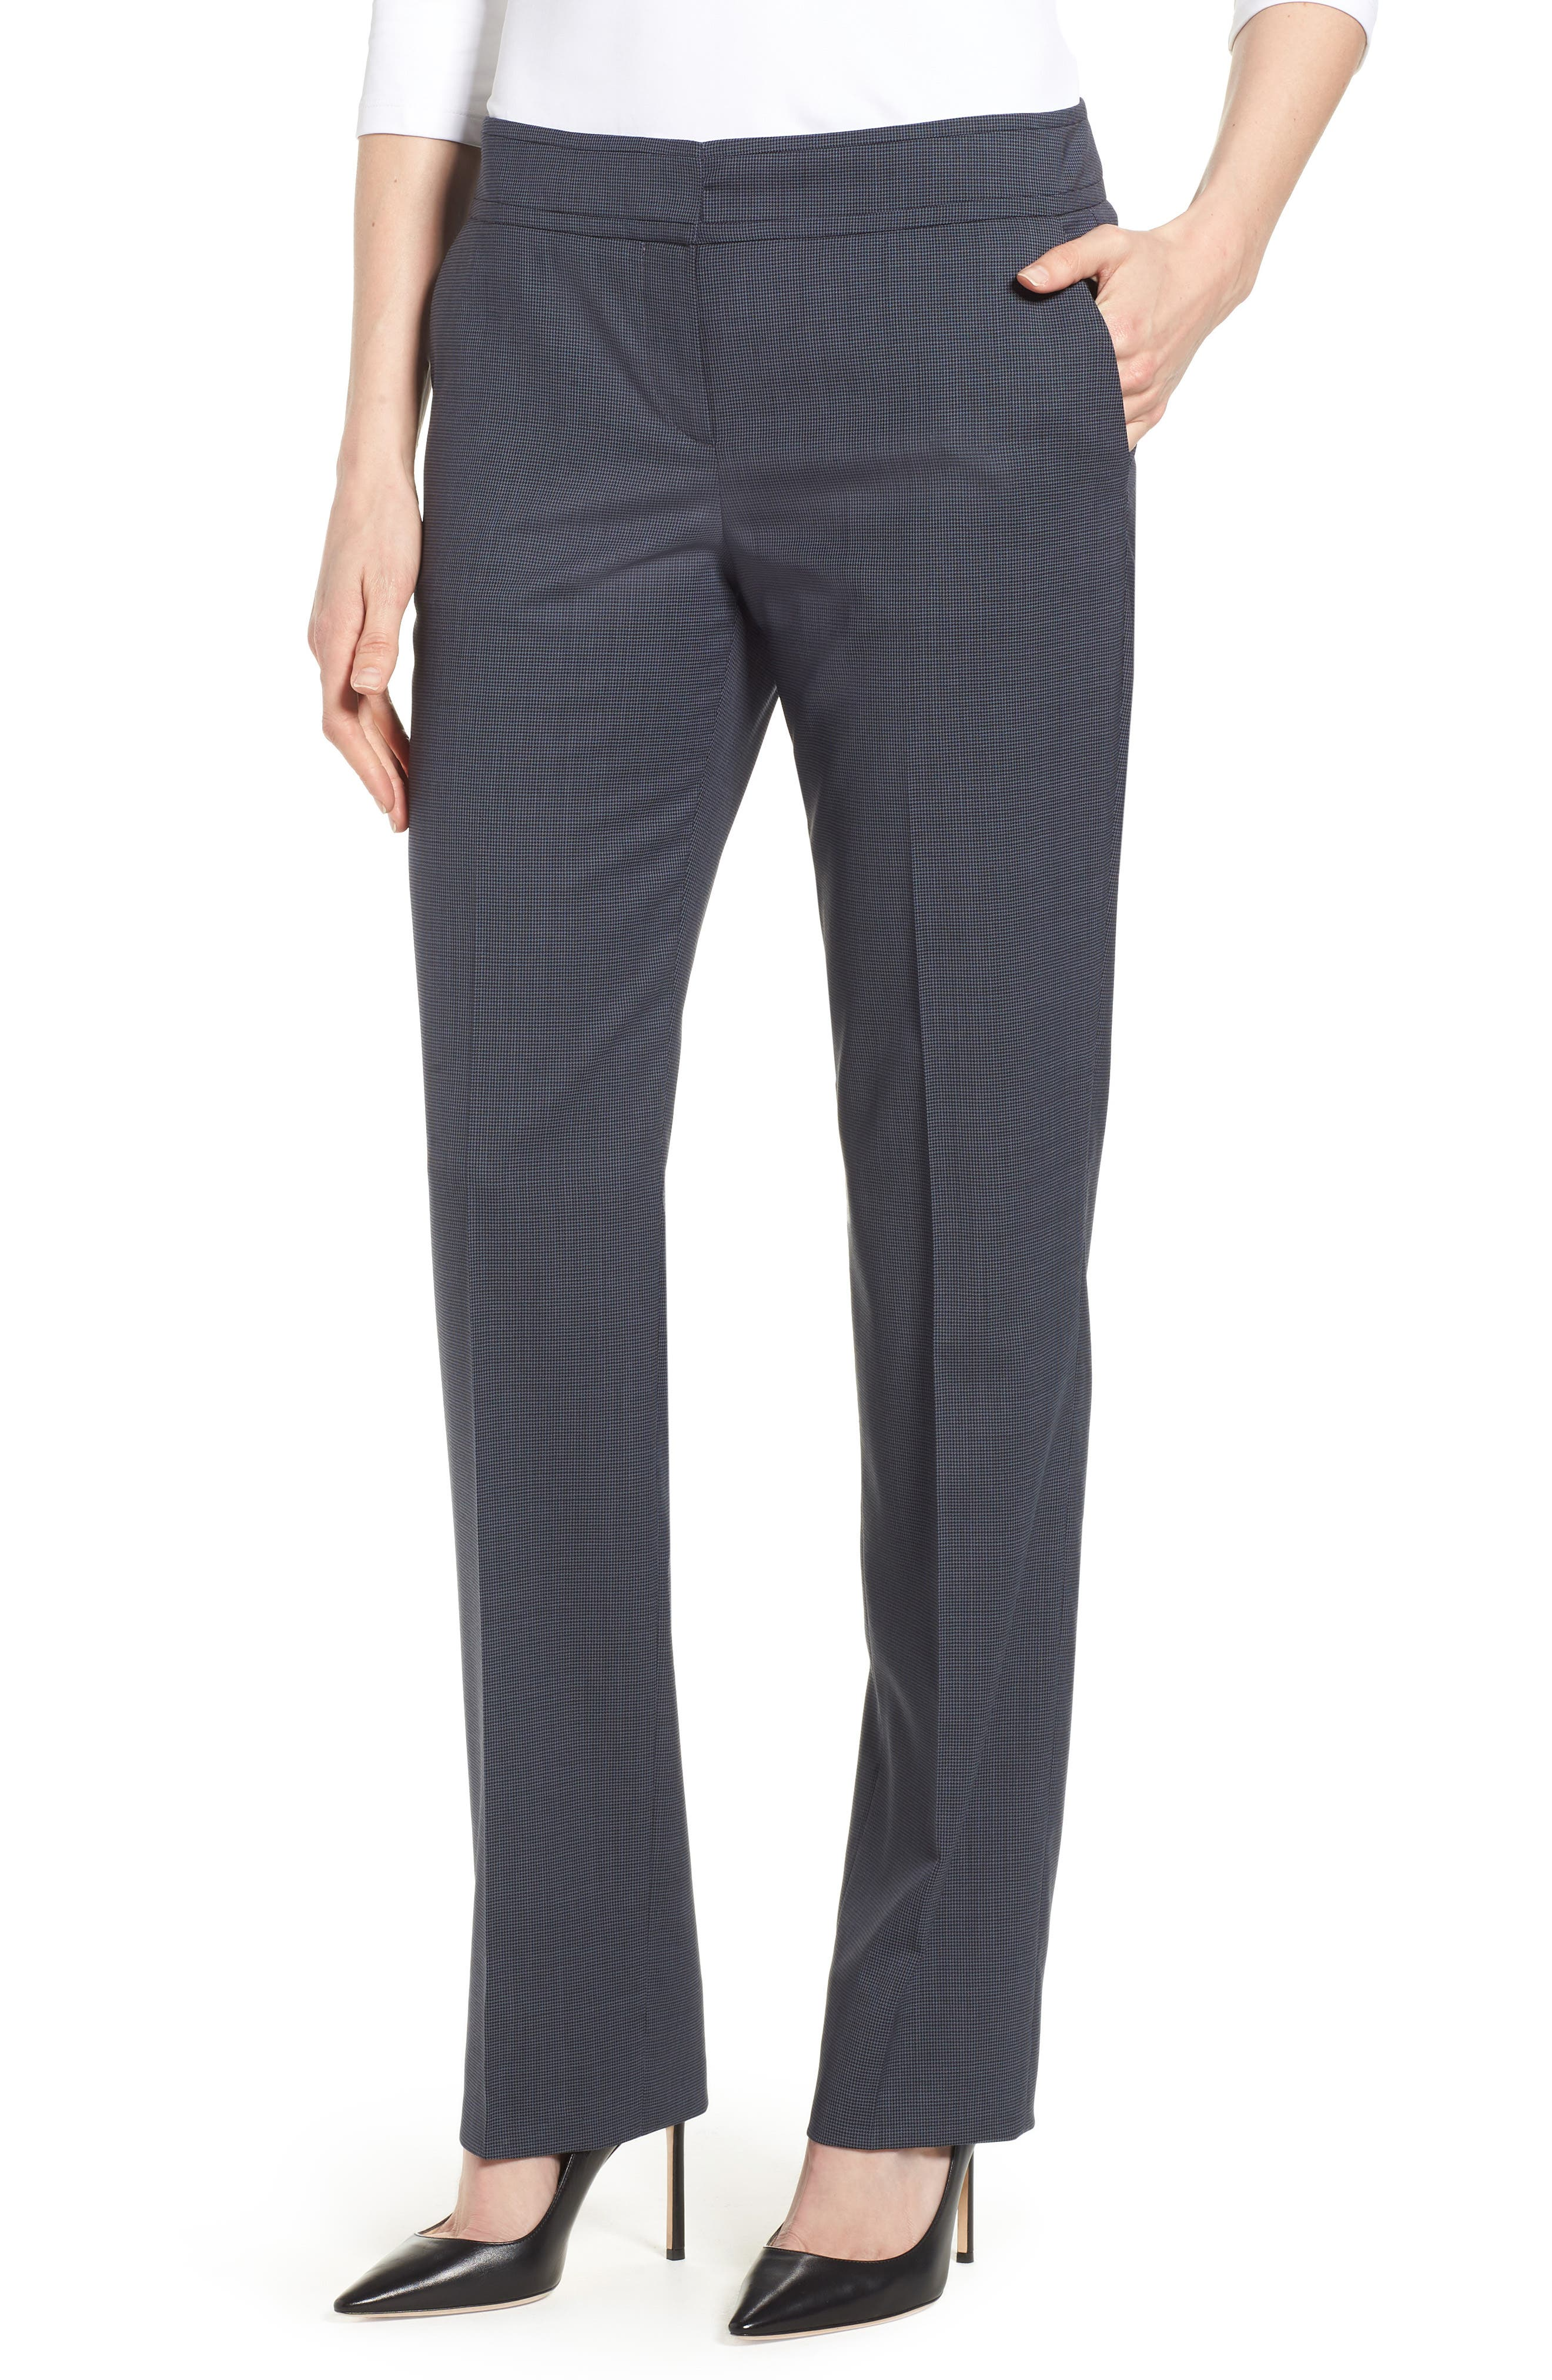 Talouise Pepita Stretch Wool Suit Pants,                             Main thumbnail 1, color,                             462